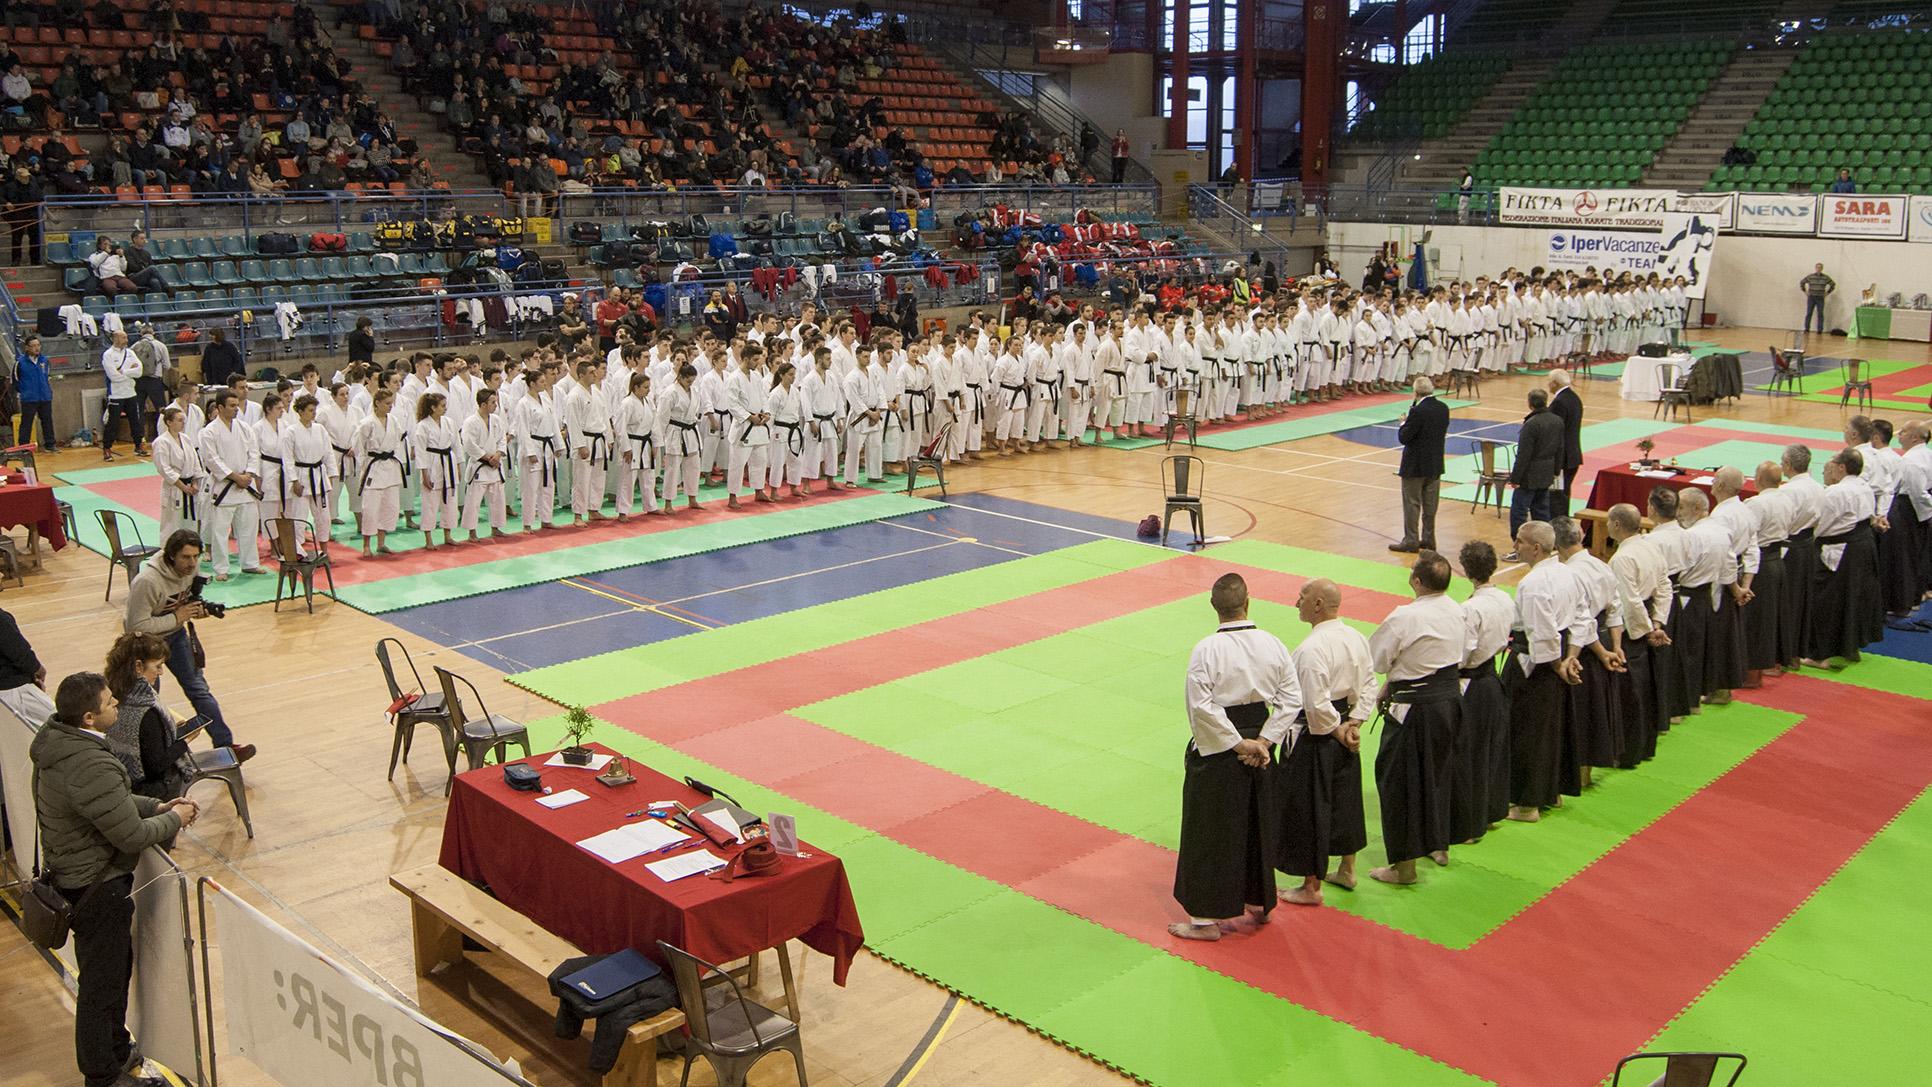 budokan_trofeo_regioni_2018_inizio gara